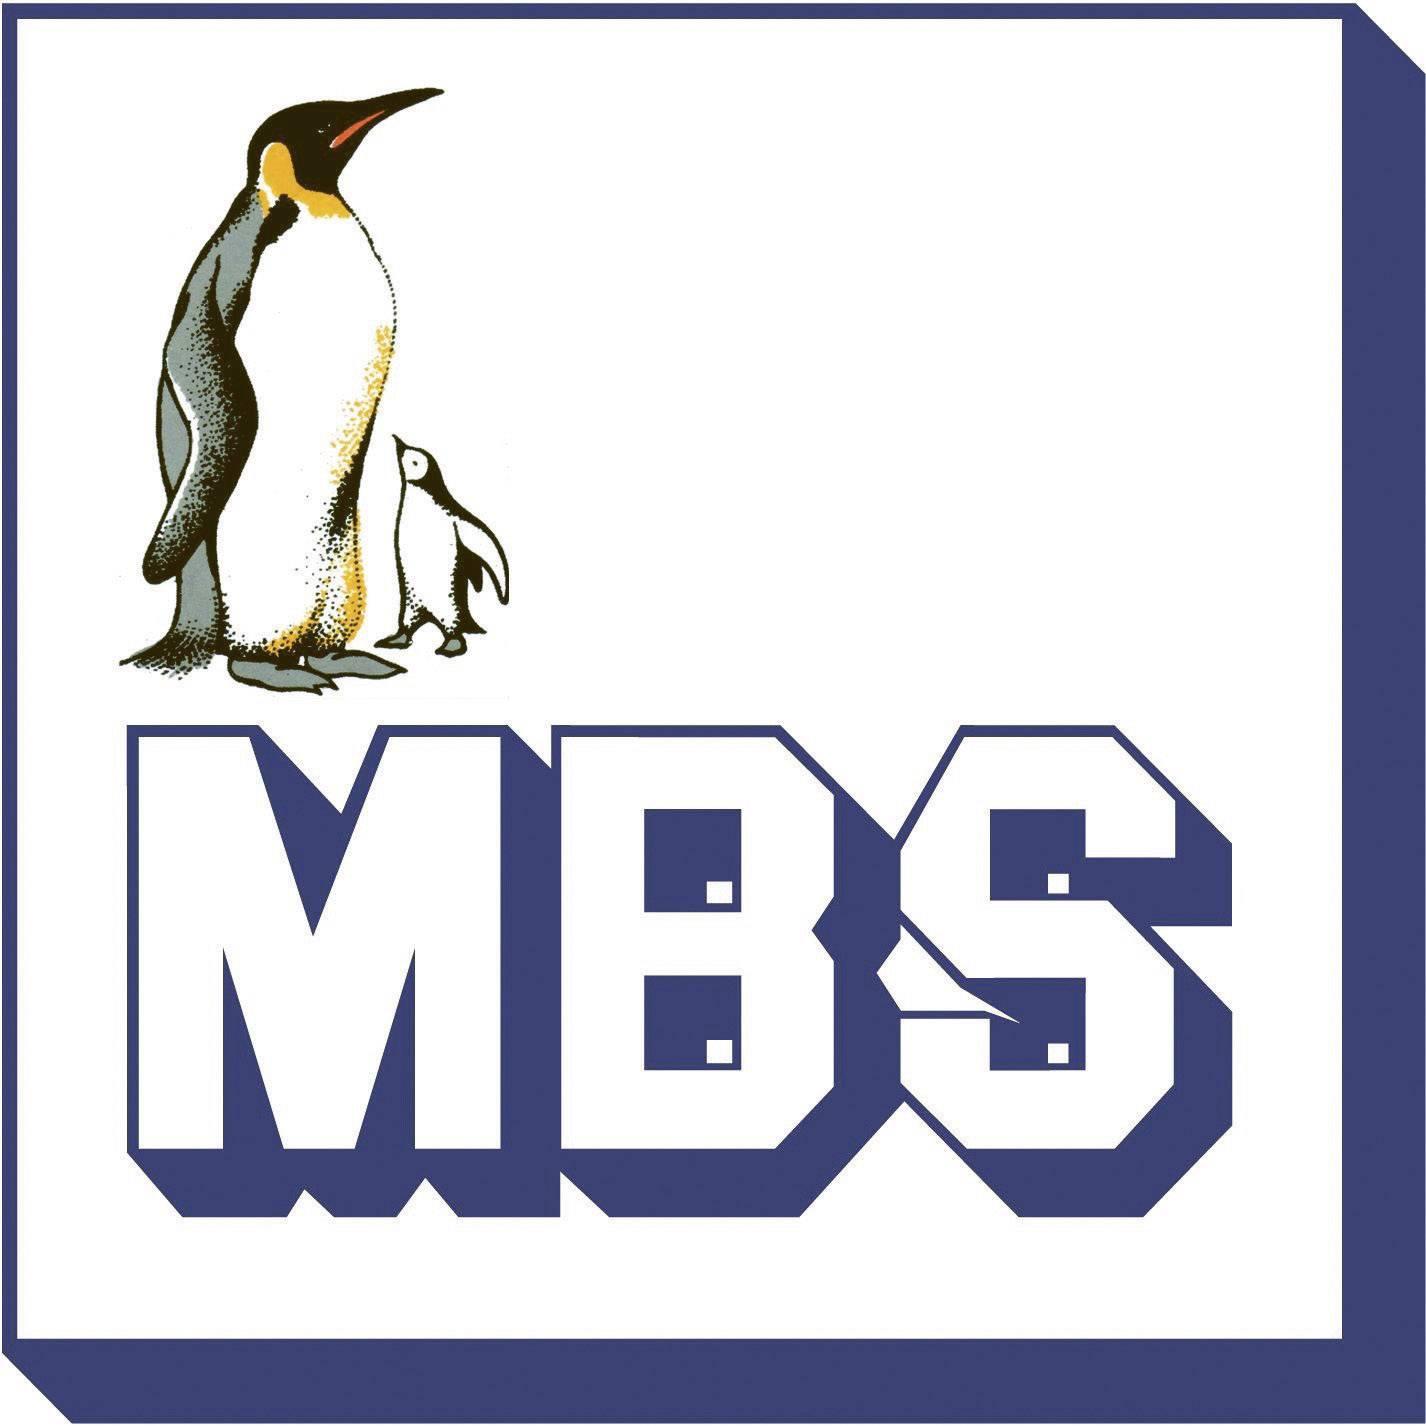 MBS ASK31.3 400/5A  Primarna struja 400 A Sekundarna struja 5 A  Ø provoda vodiča:26 mm vijčano pričvršćivanje 1 St.